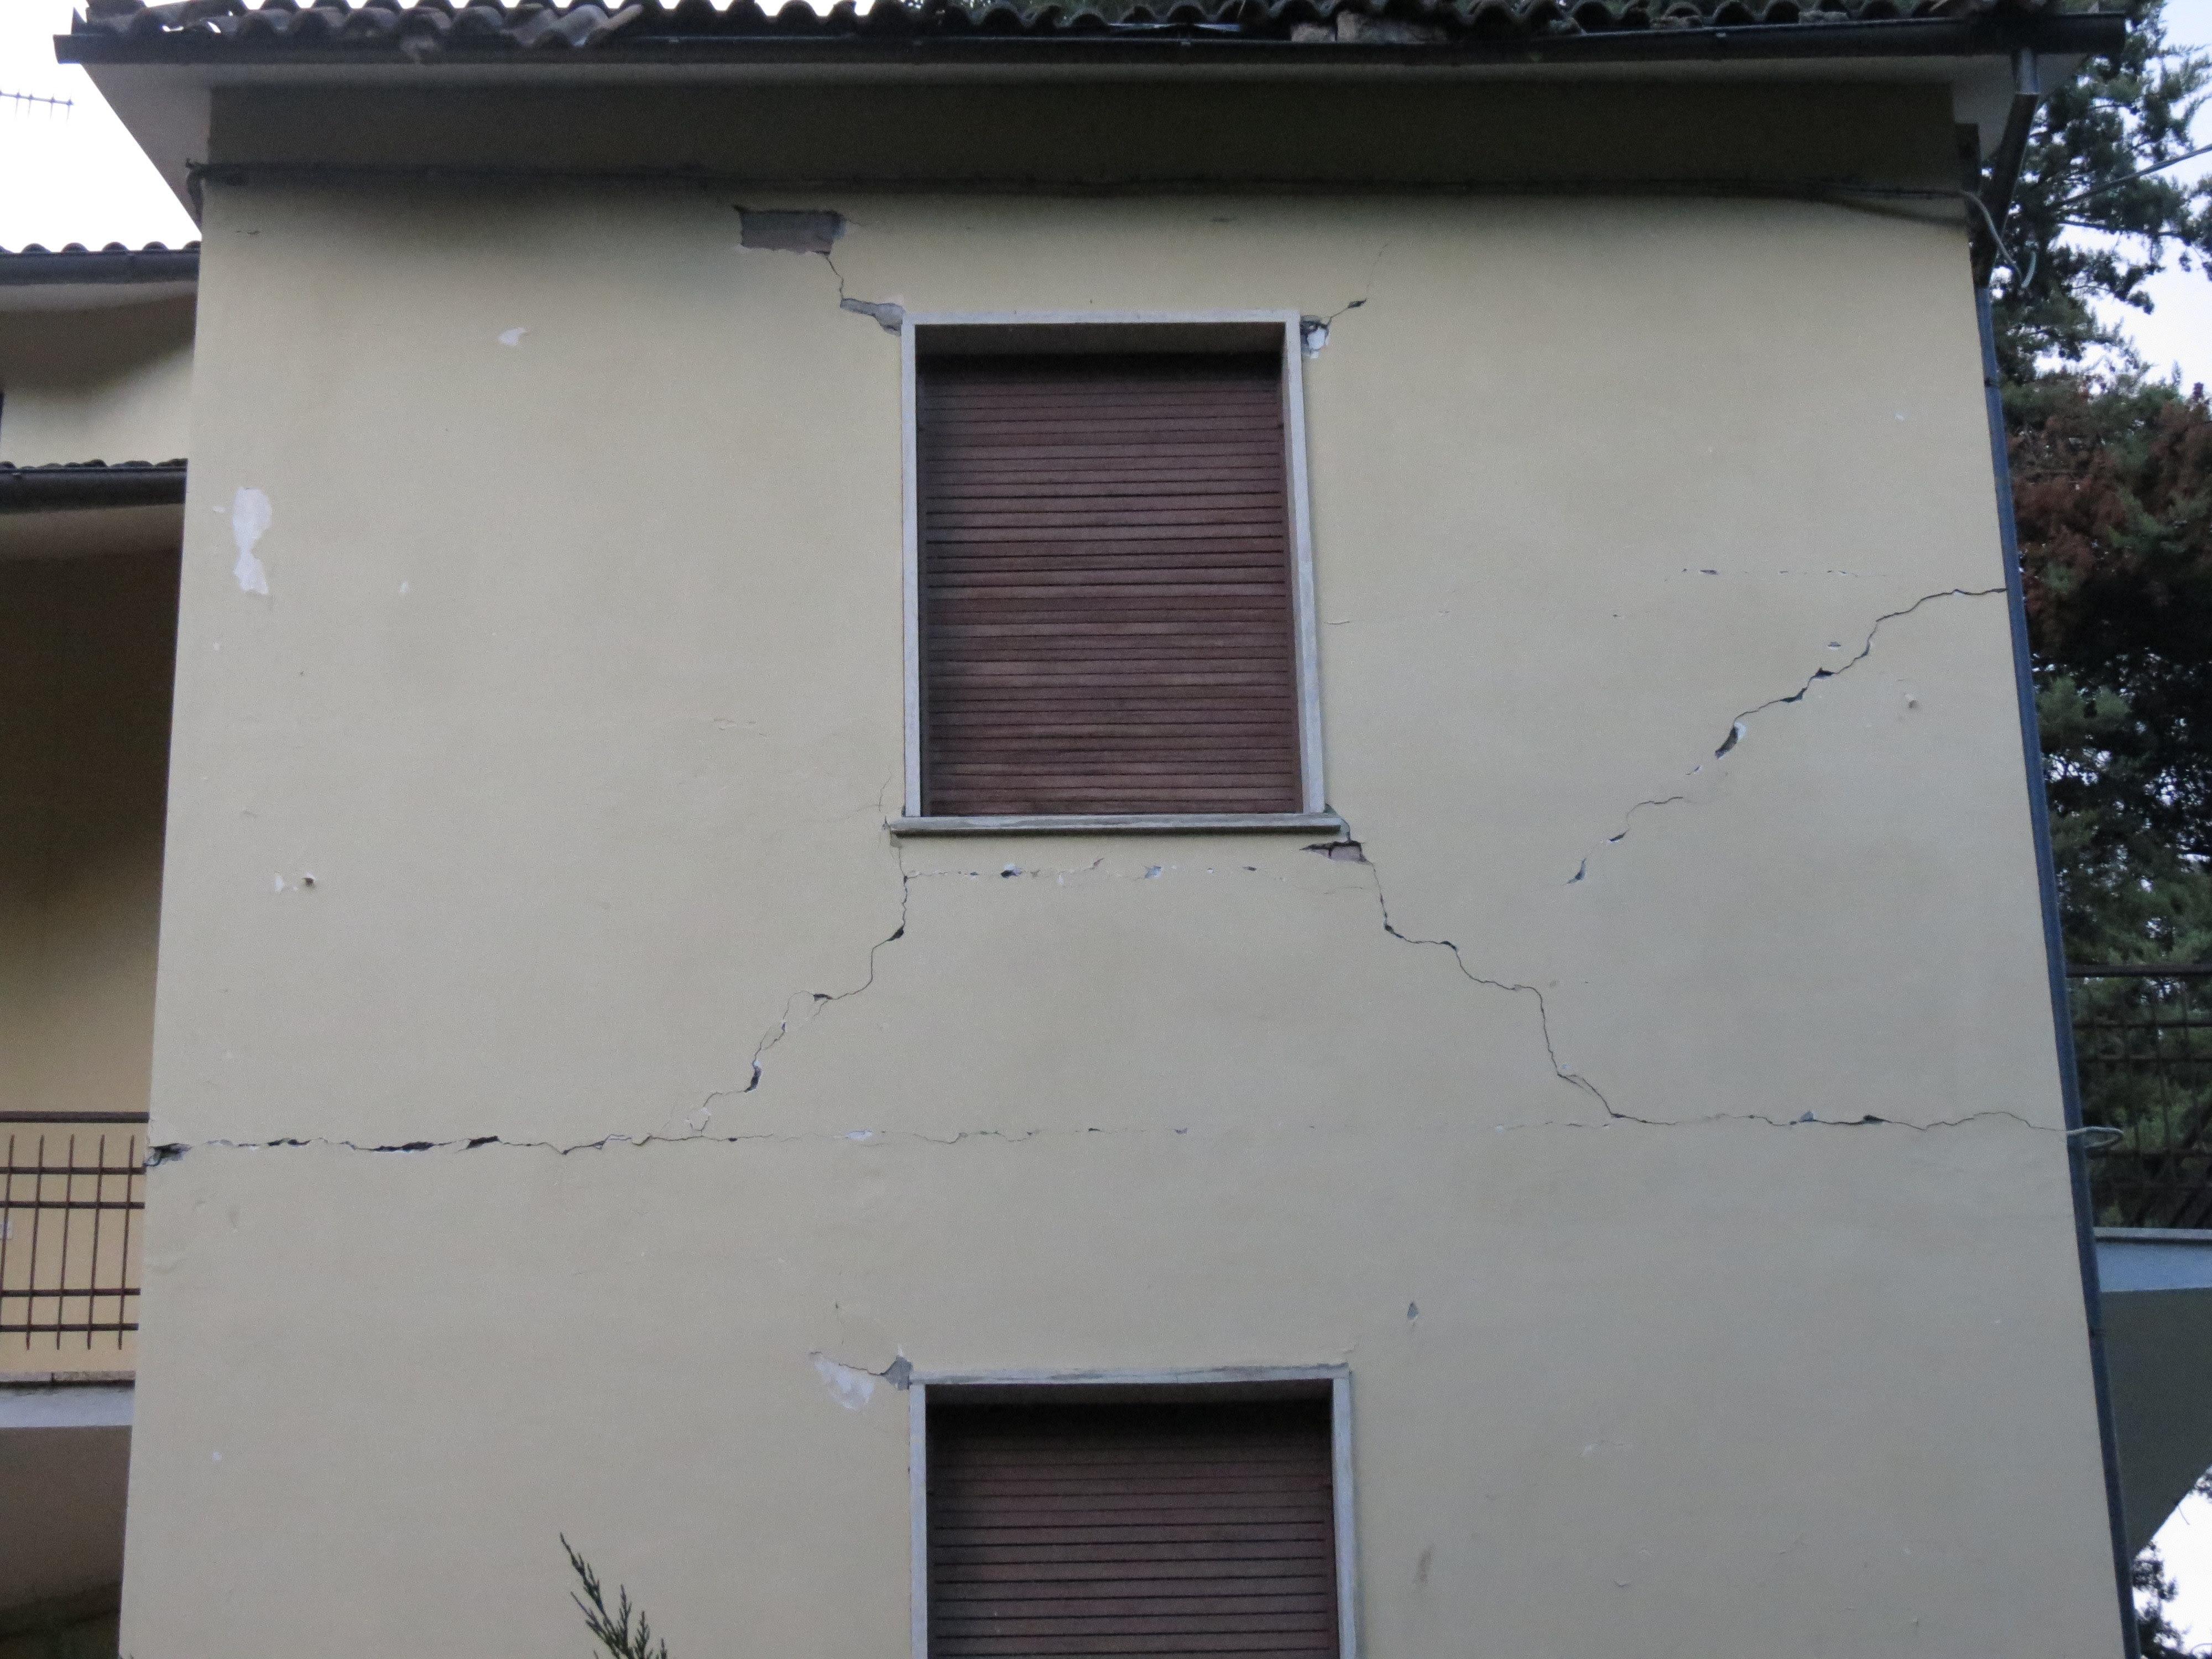 quake-damage-house